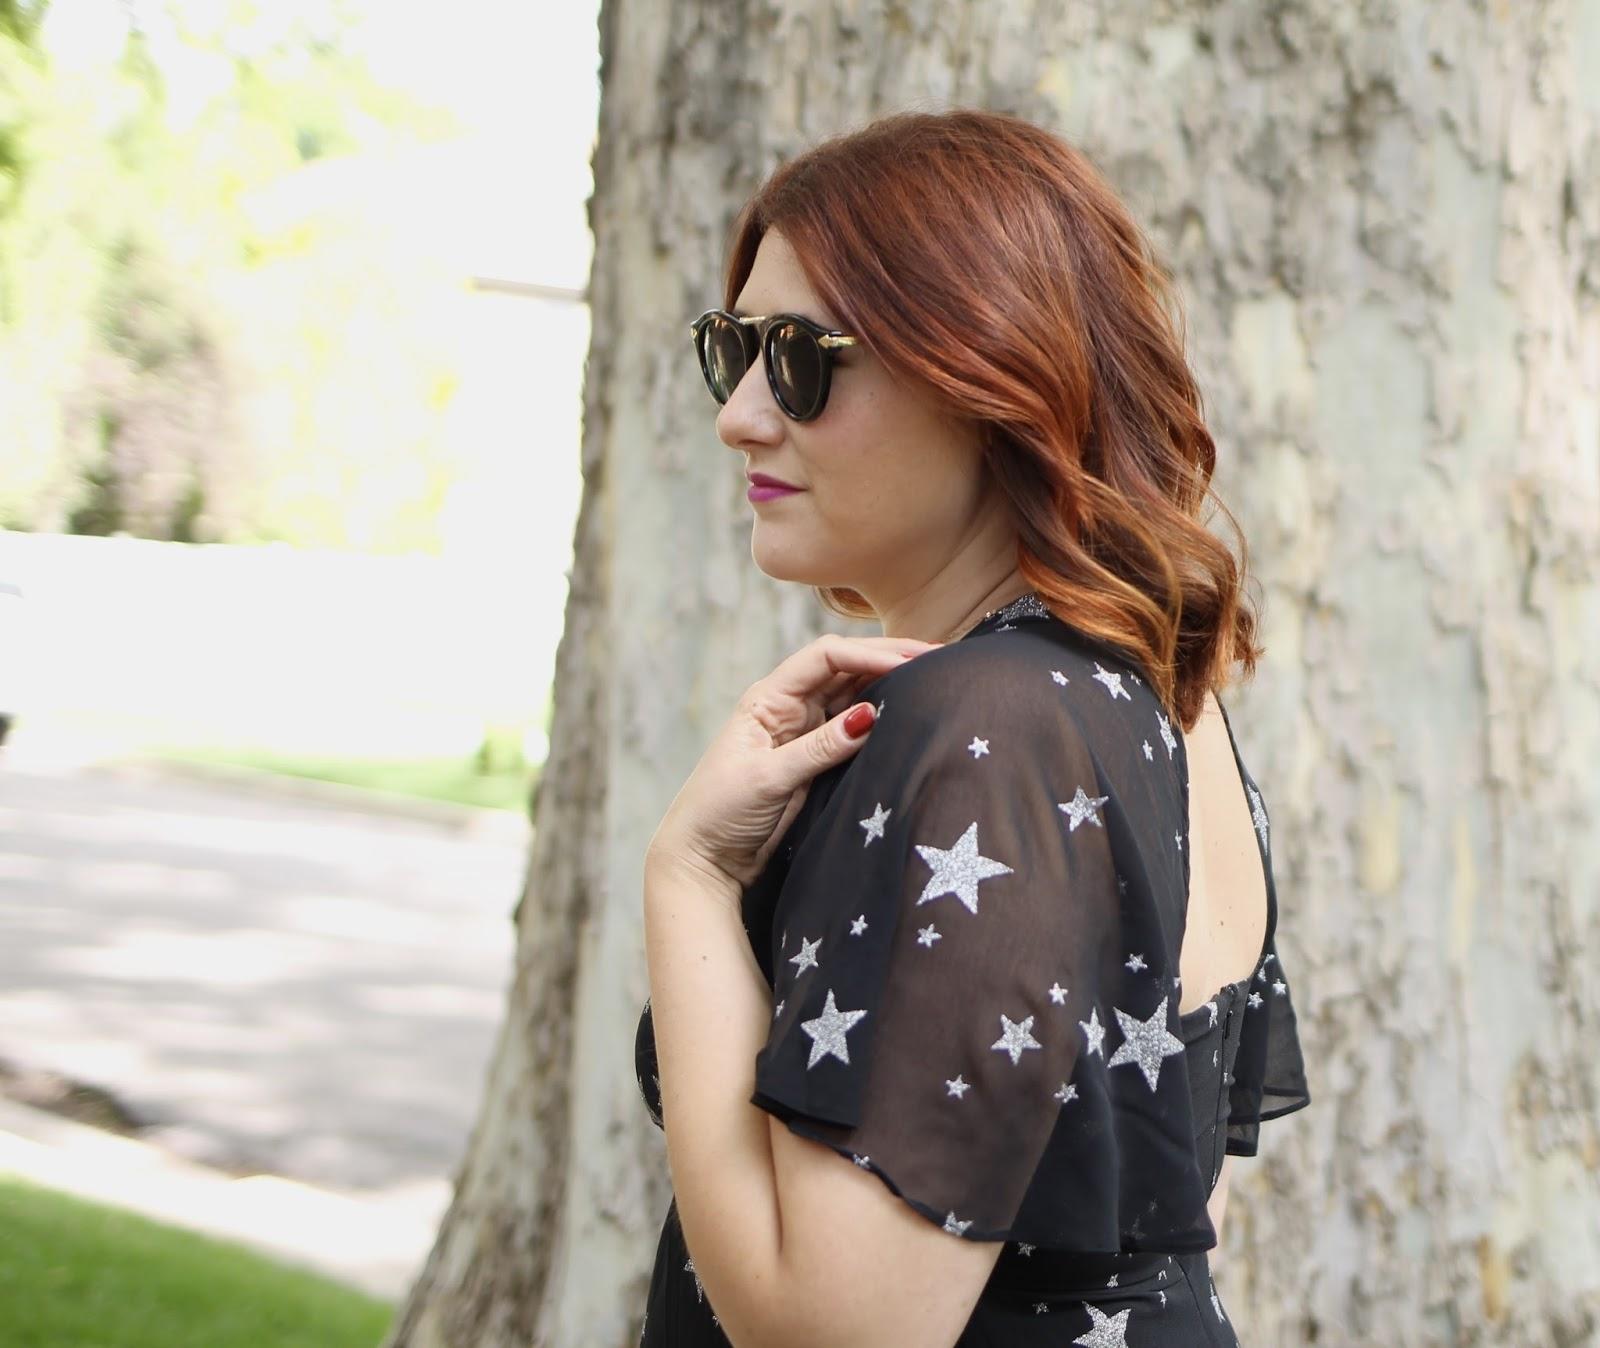 maxi dress, star print, red hair, rebecca minkooff quilted clutch